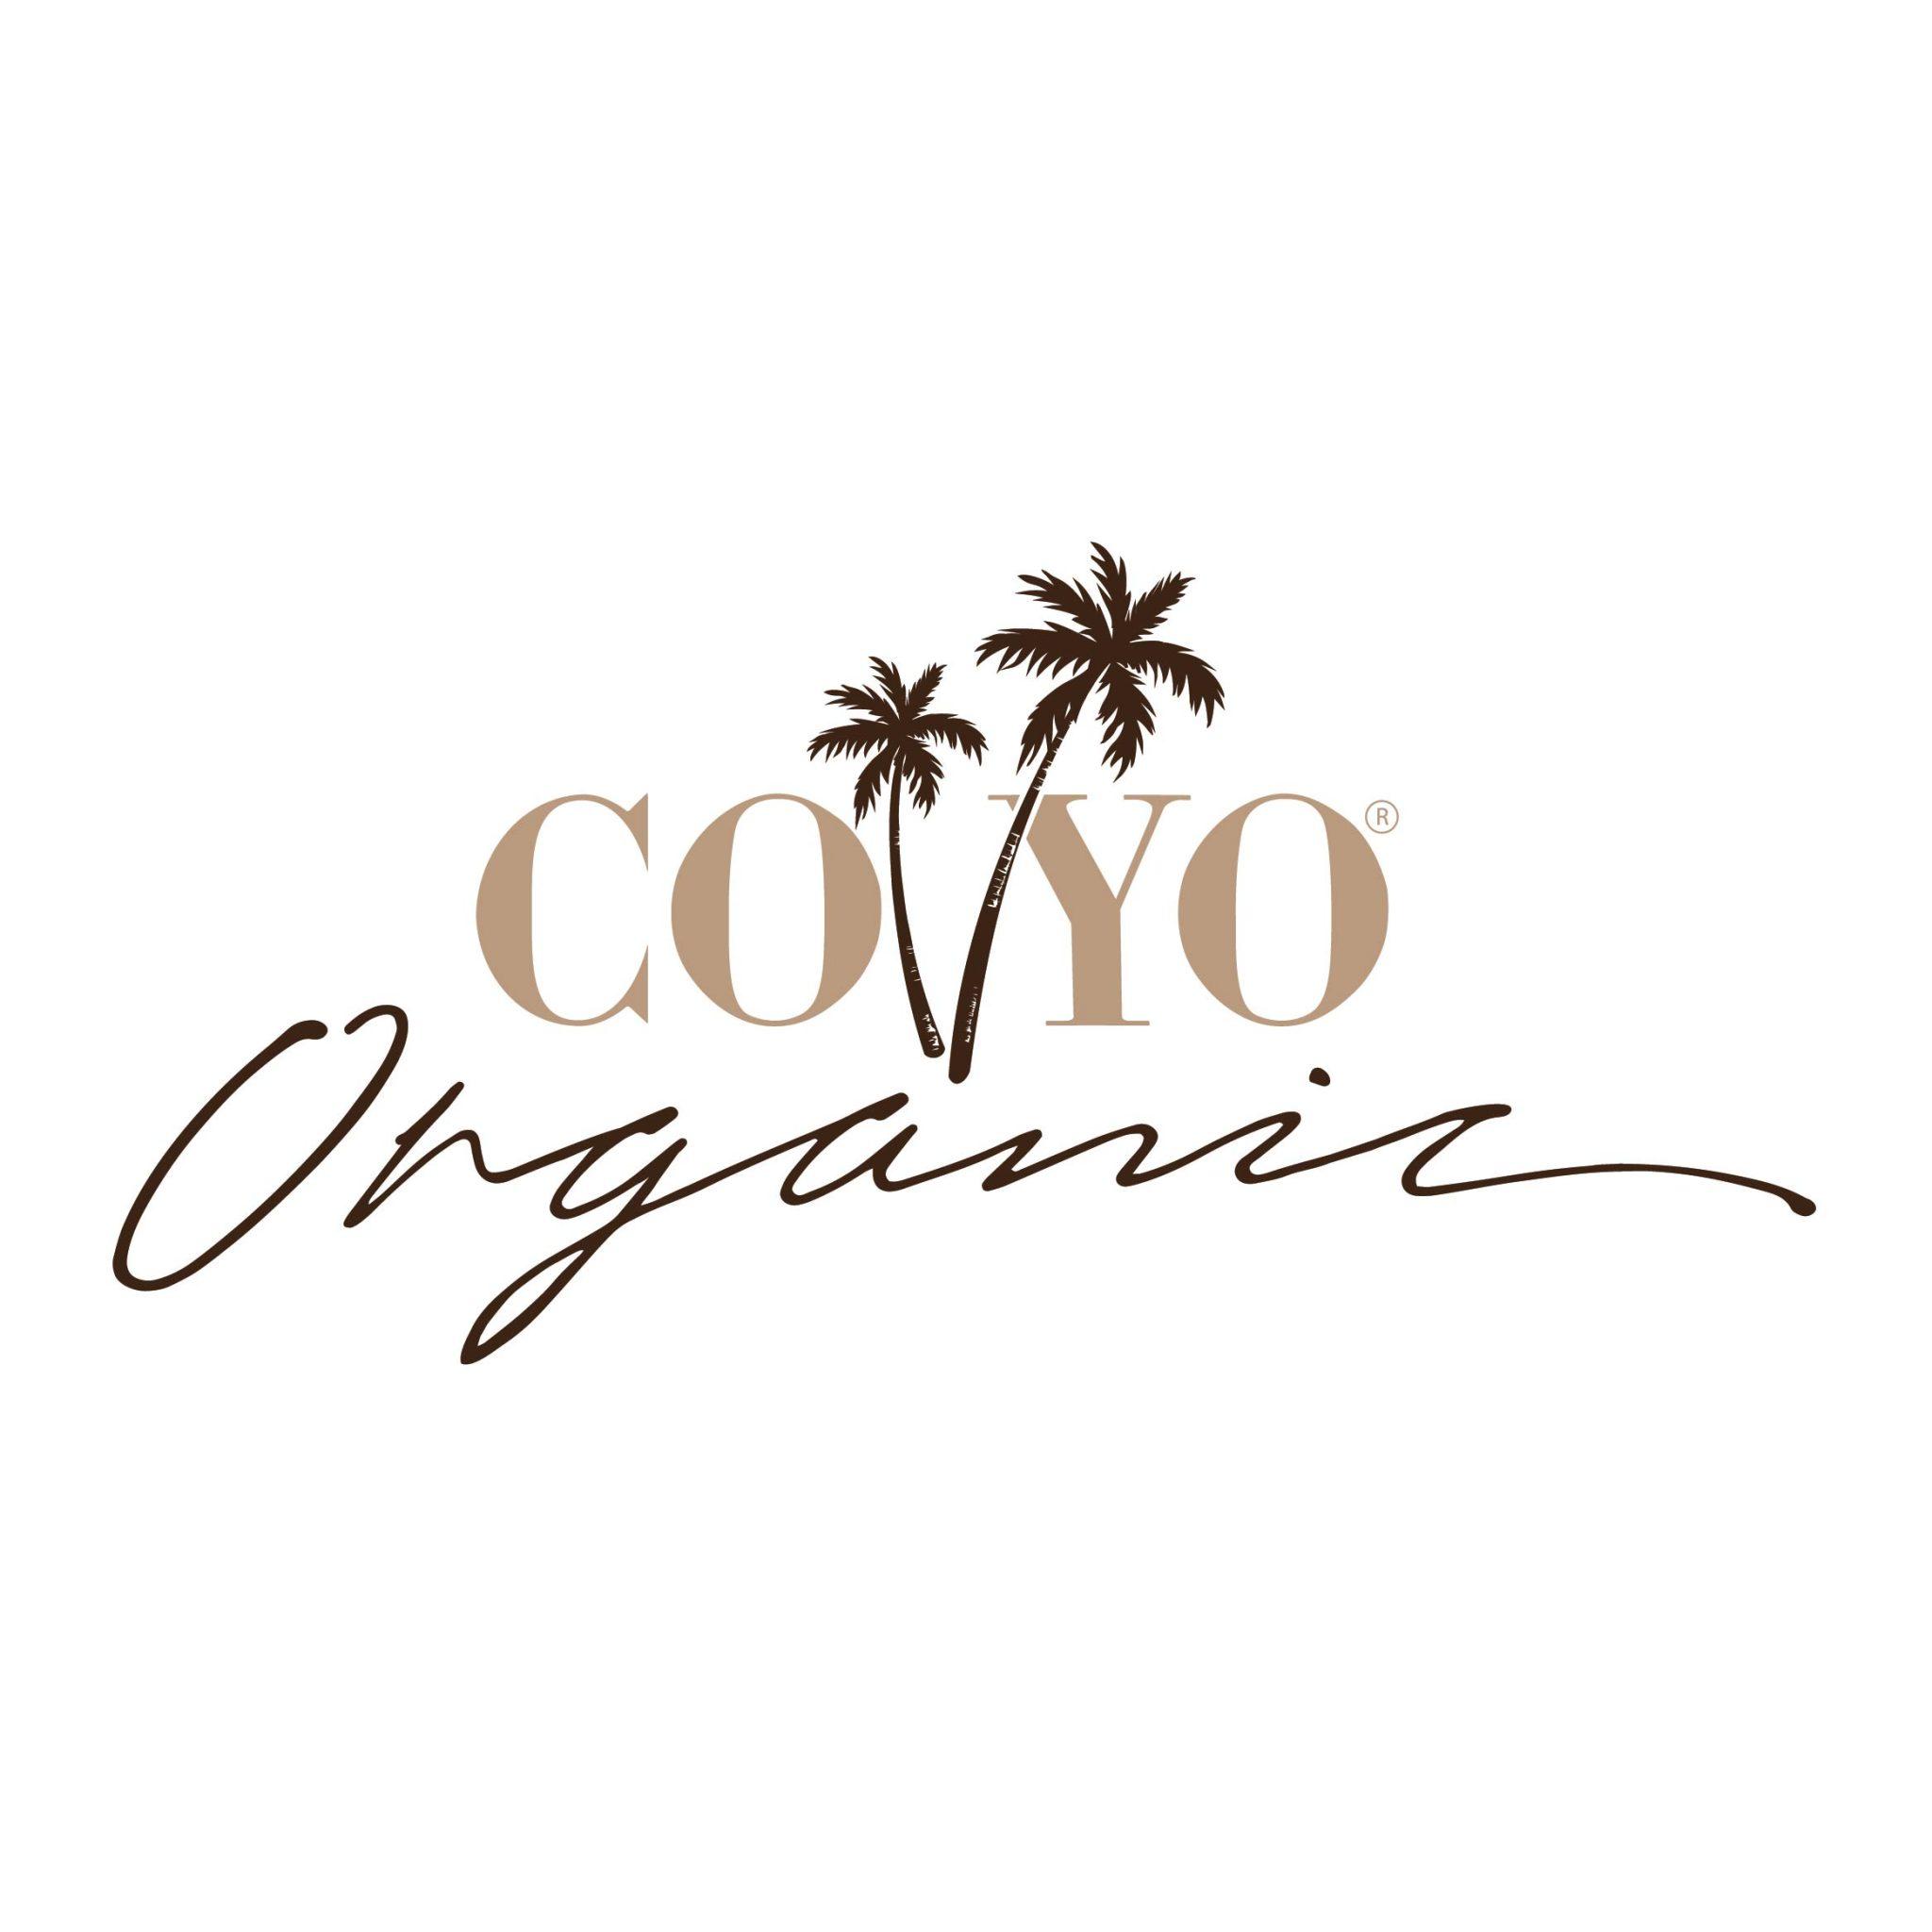 COYO Organic logo - Certified Paleo, Paleo Vegan by the Paleo Foundation